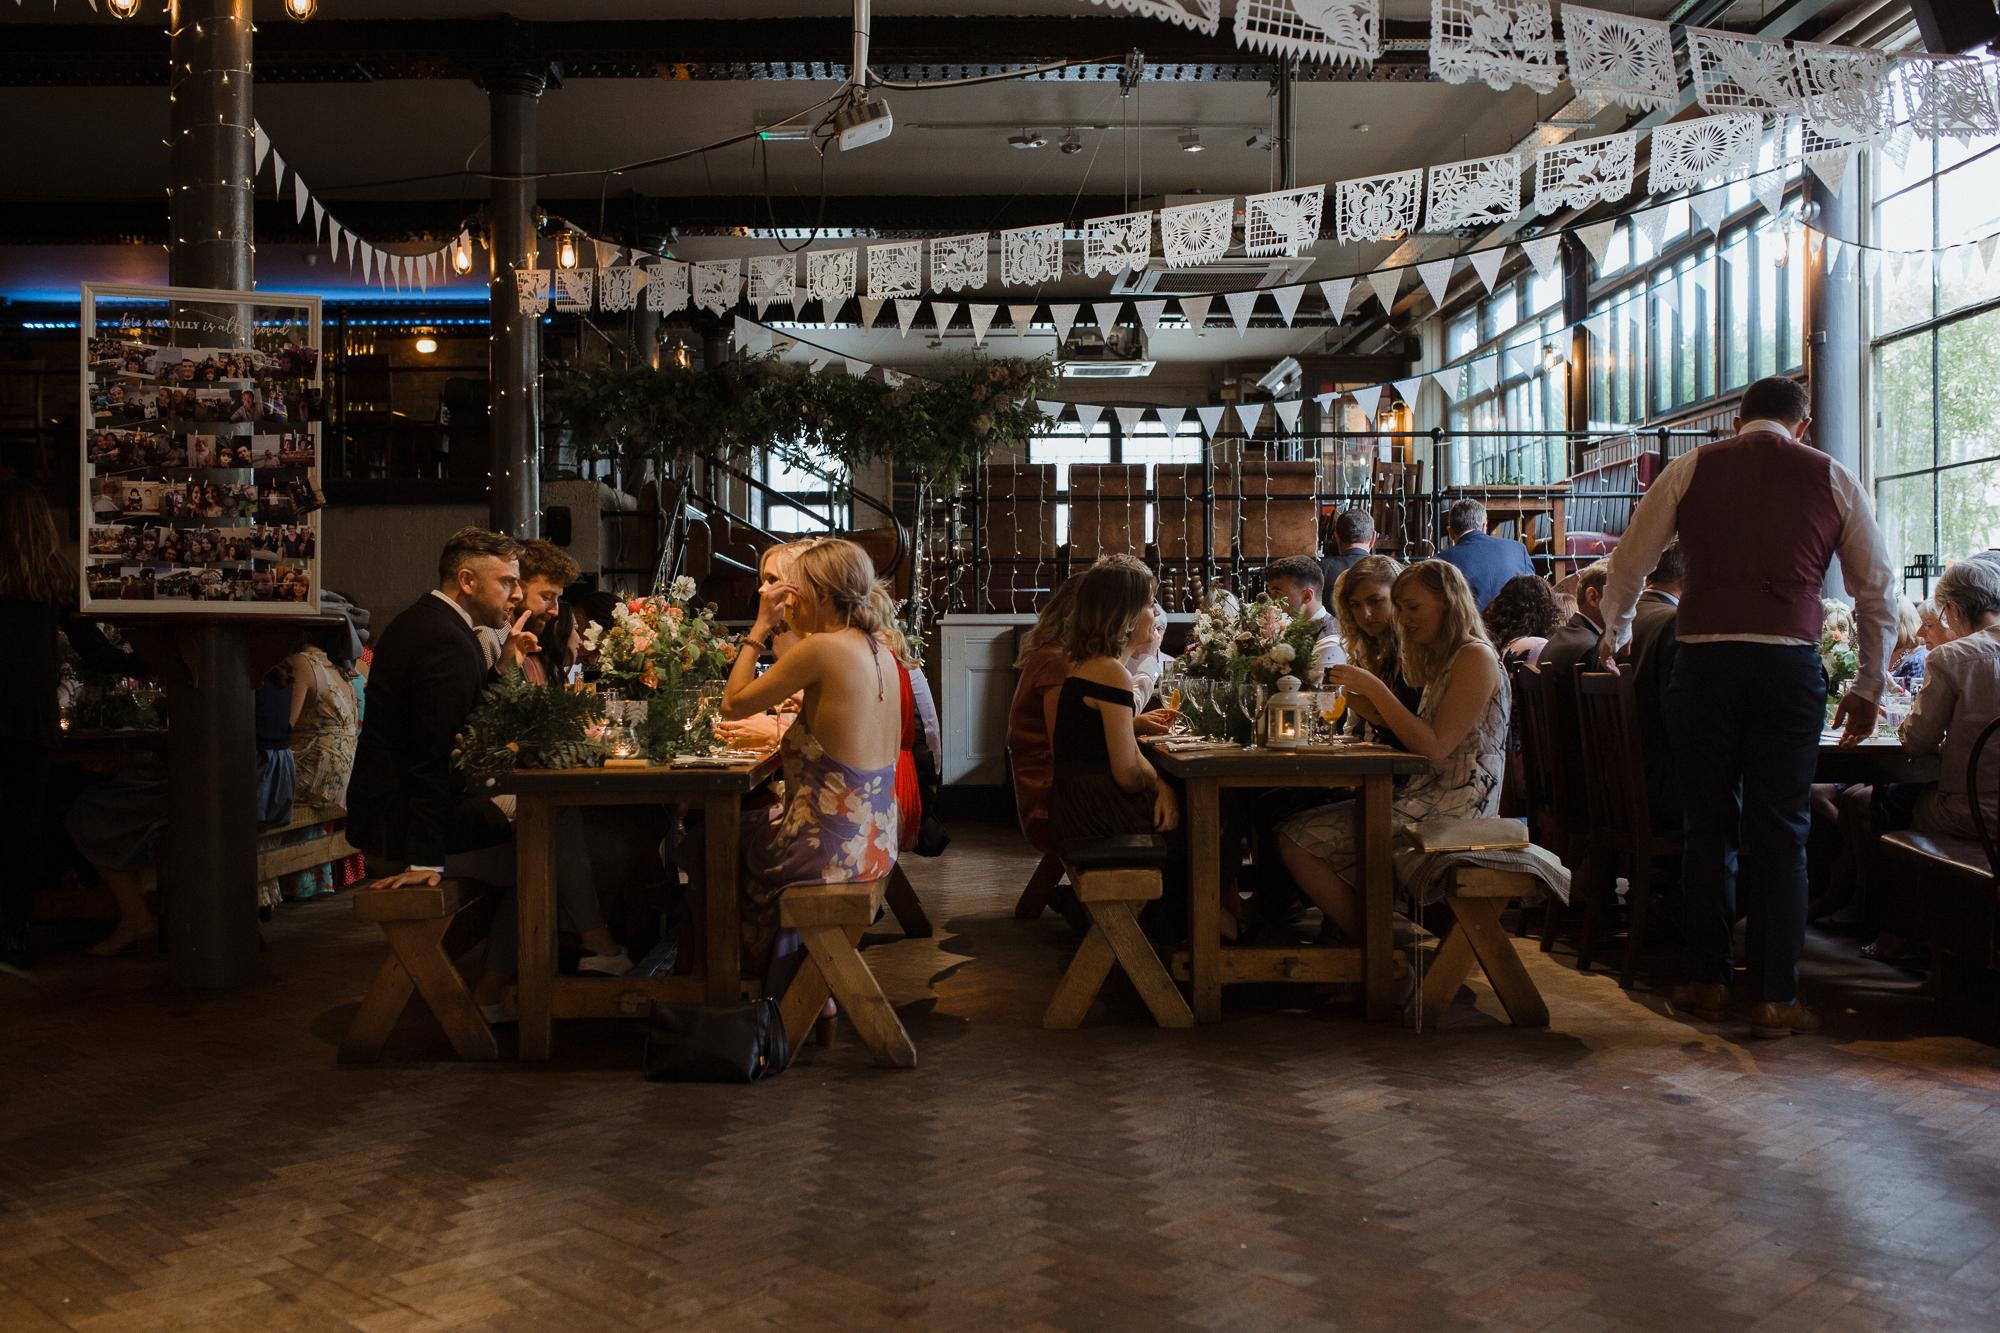 stephanie-green-wedding-photography-sulaflowers-sula-flowers-london-islington-town-hall-depot-n7-156.jpg